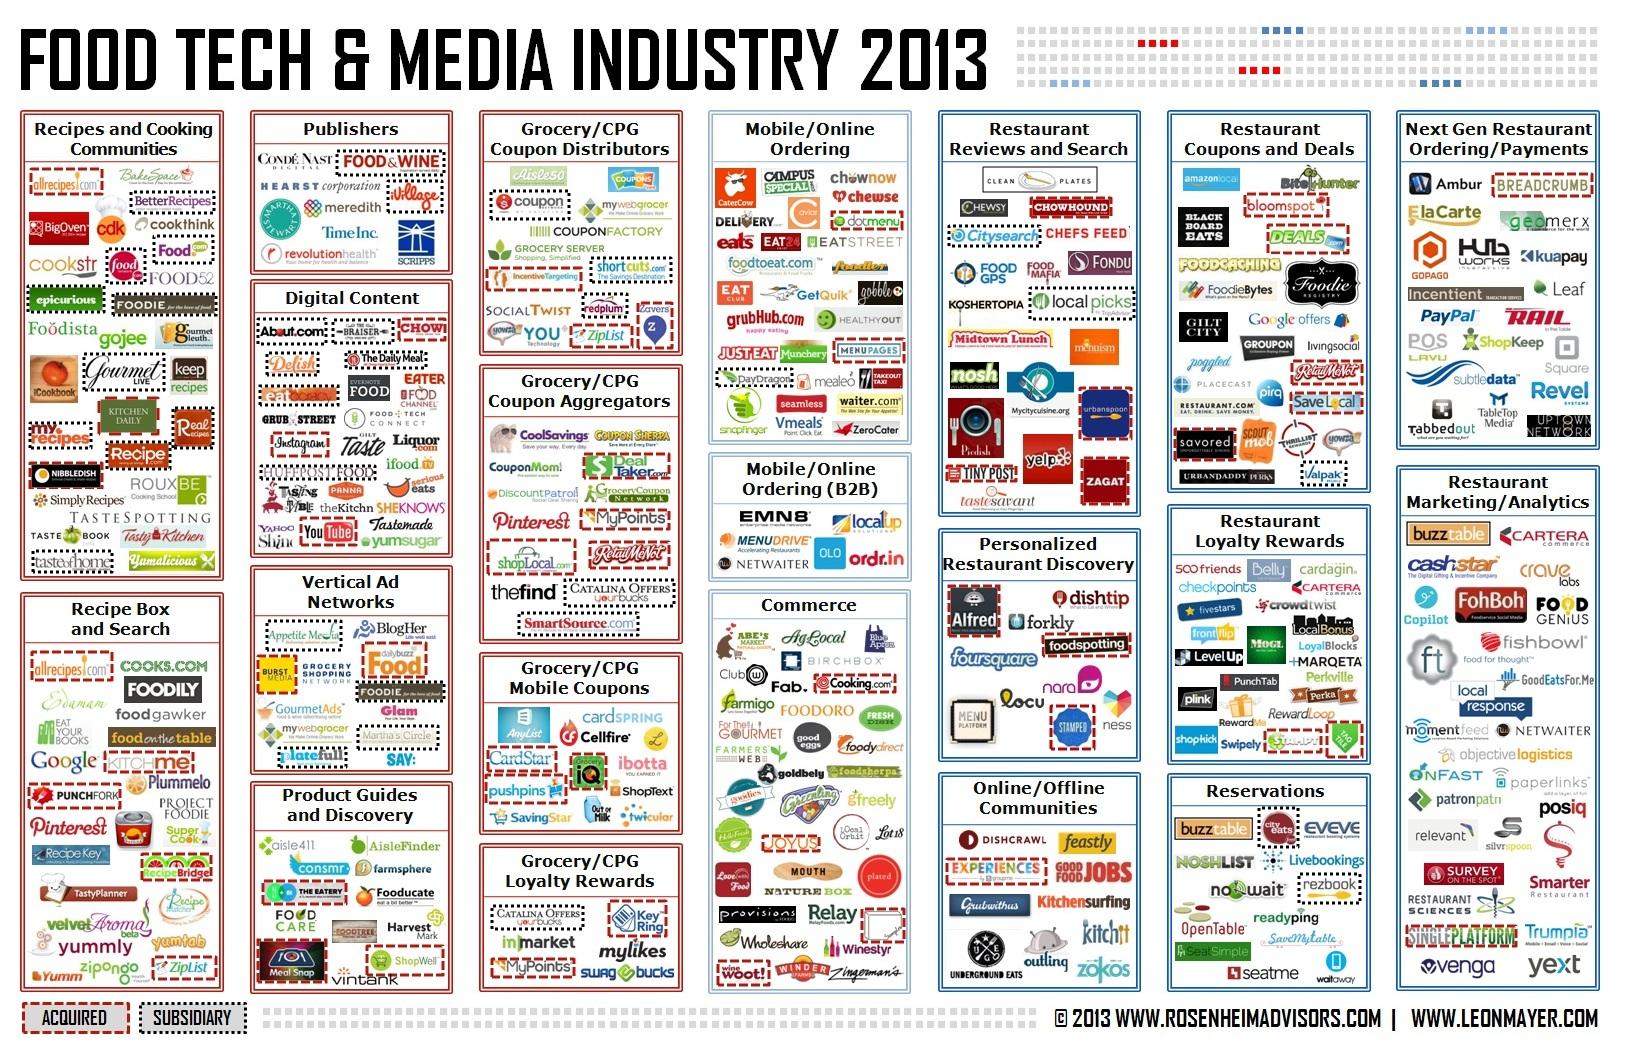 Food Tech and Media Industry 2013 - Rosenheim Advisors & Leon Mayer